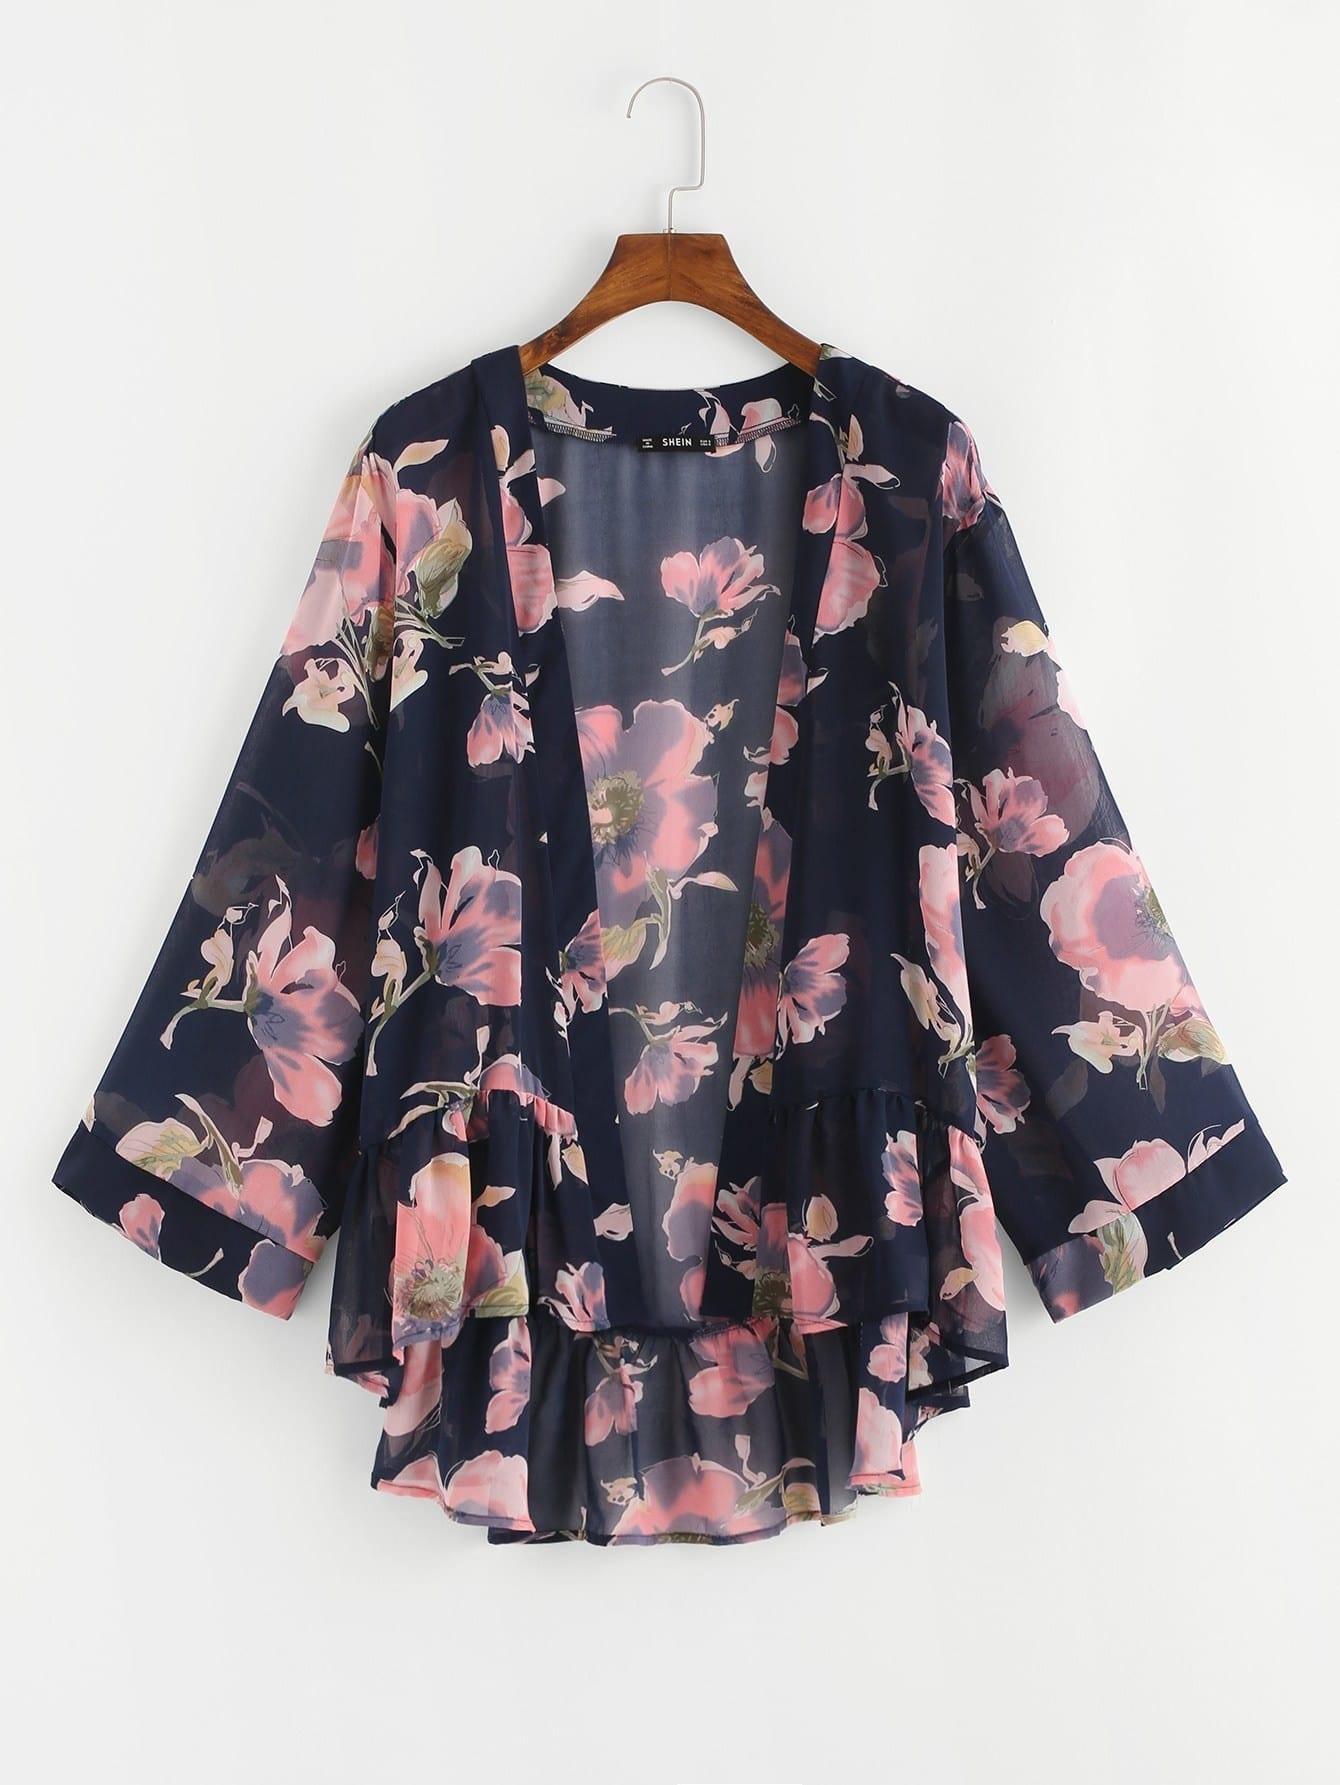 Flower Print Asymmetrical Ruffle Hem Kimono flower print ruffle hem top